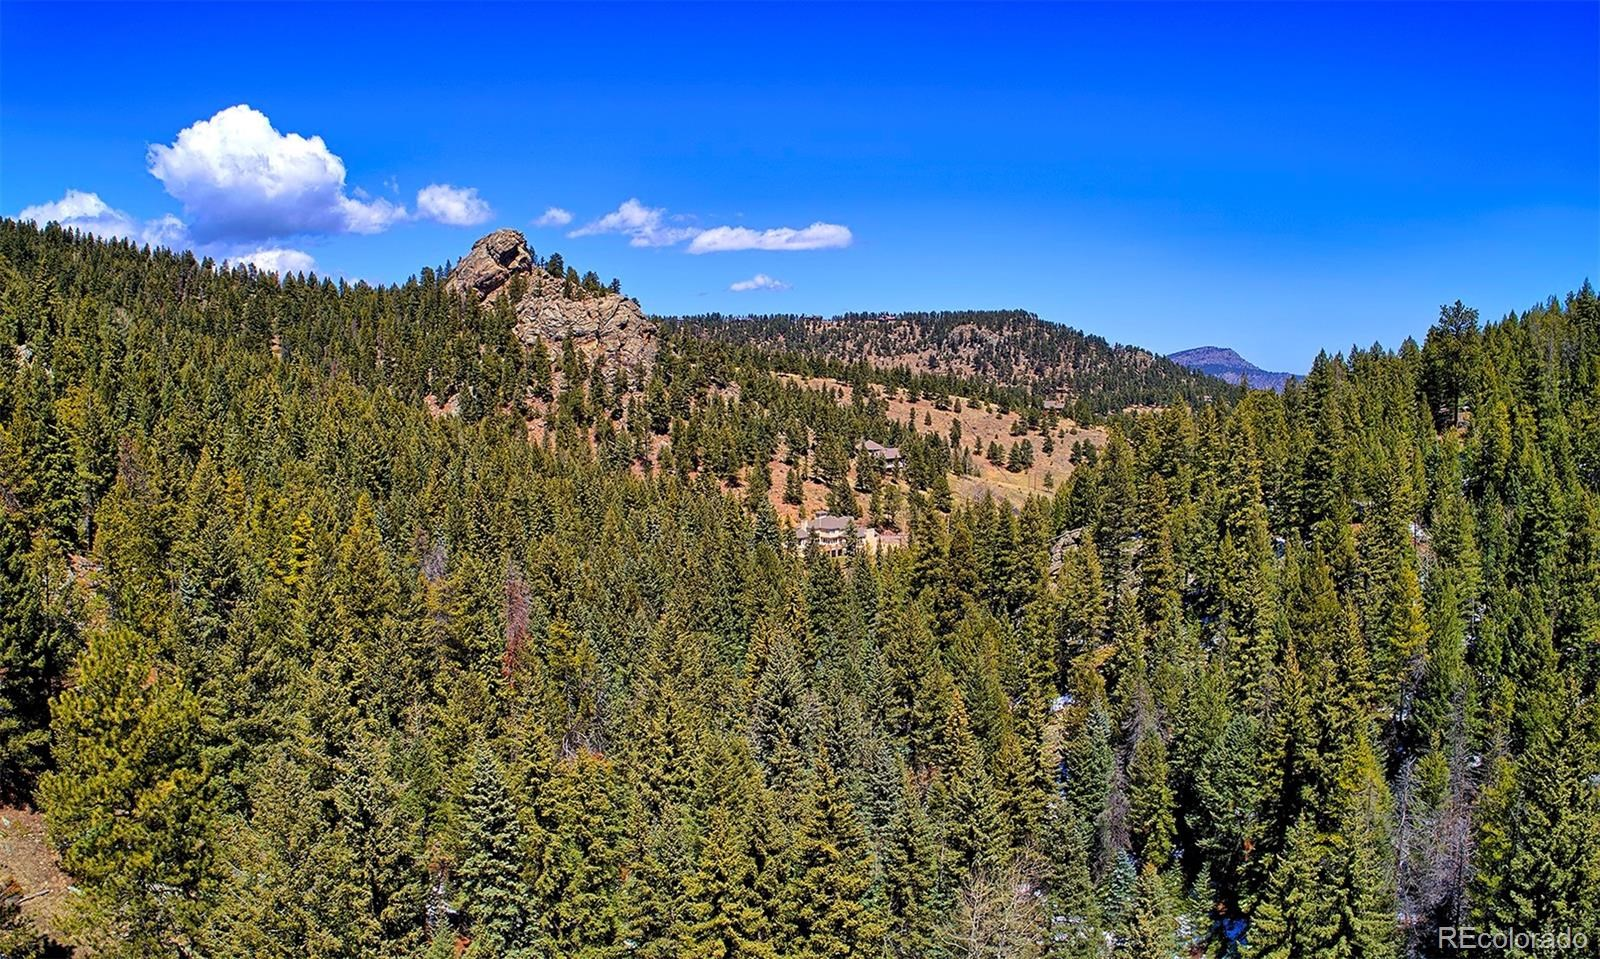 MLS# 2193114 - 7 - 1 Mountain Estate Drive, Evergreen, CO 80439